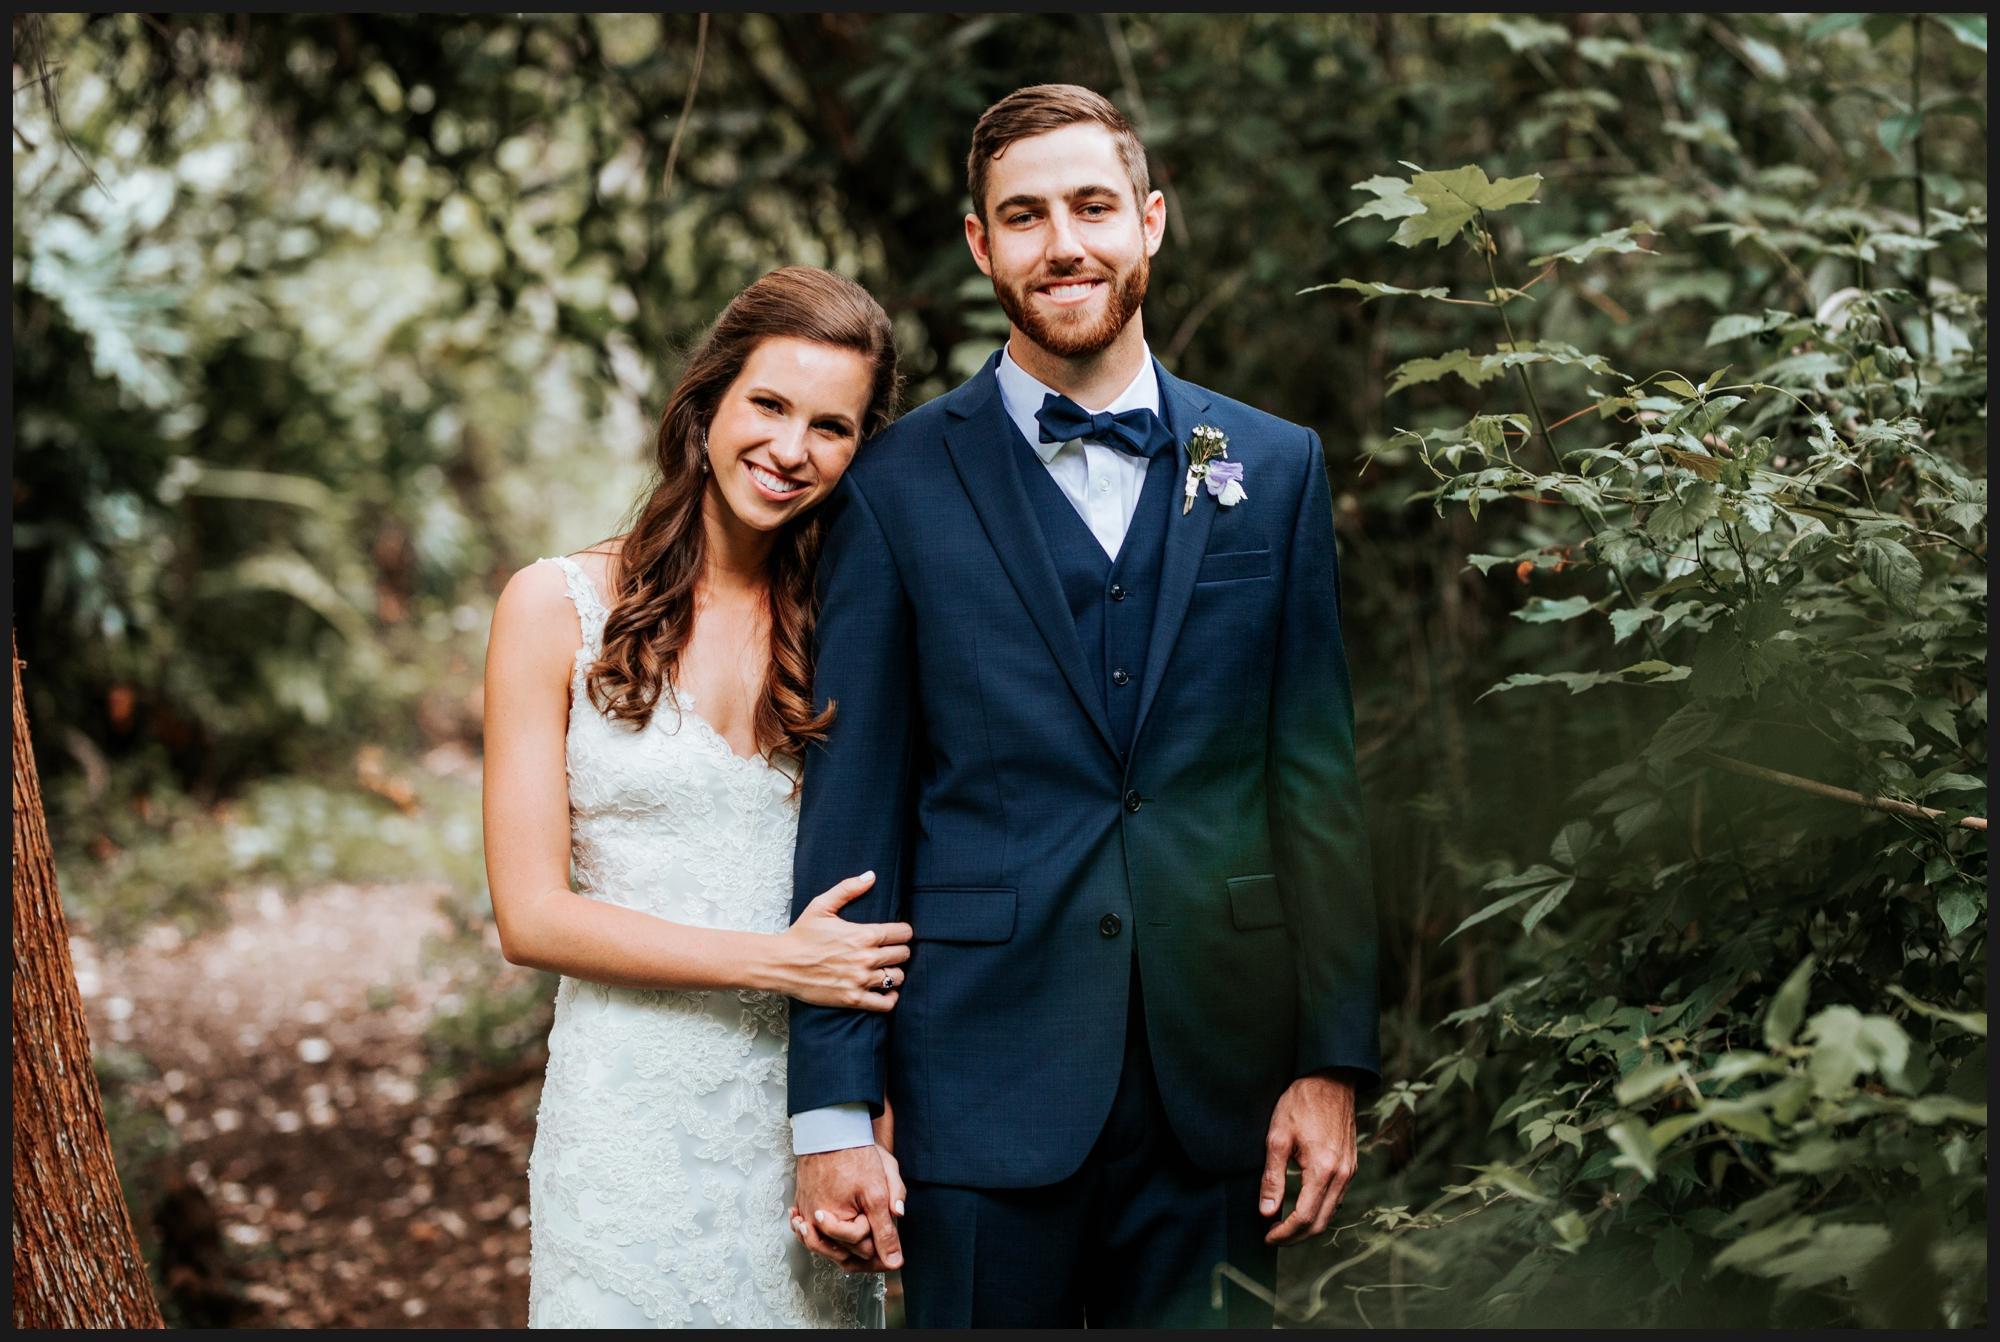 Orlando-Wedding-Photographer_0105.jpg